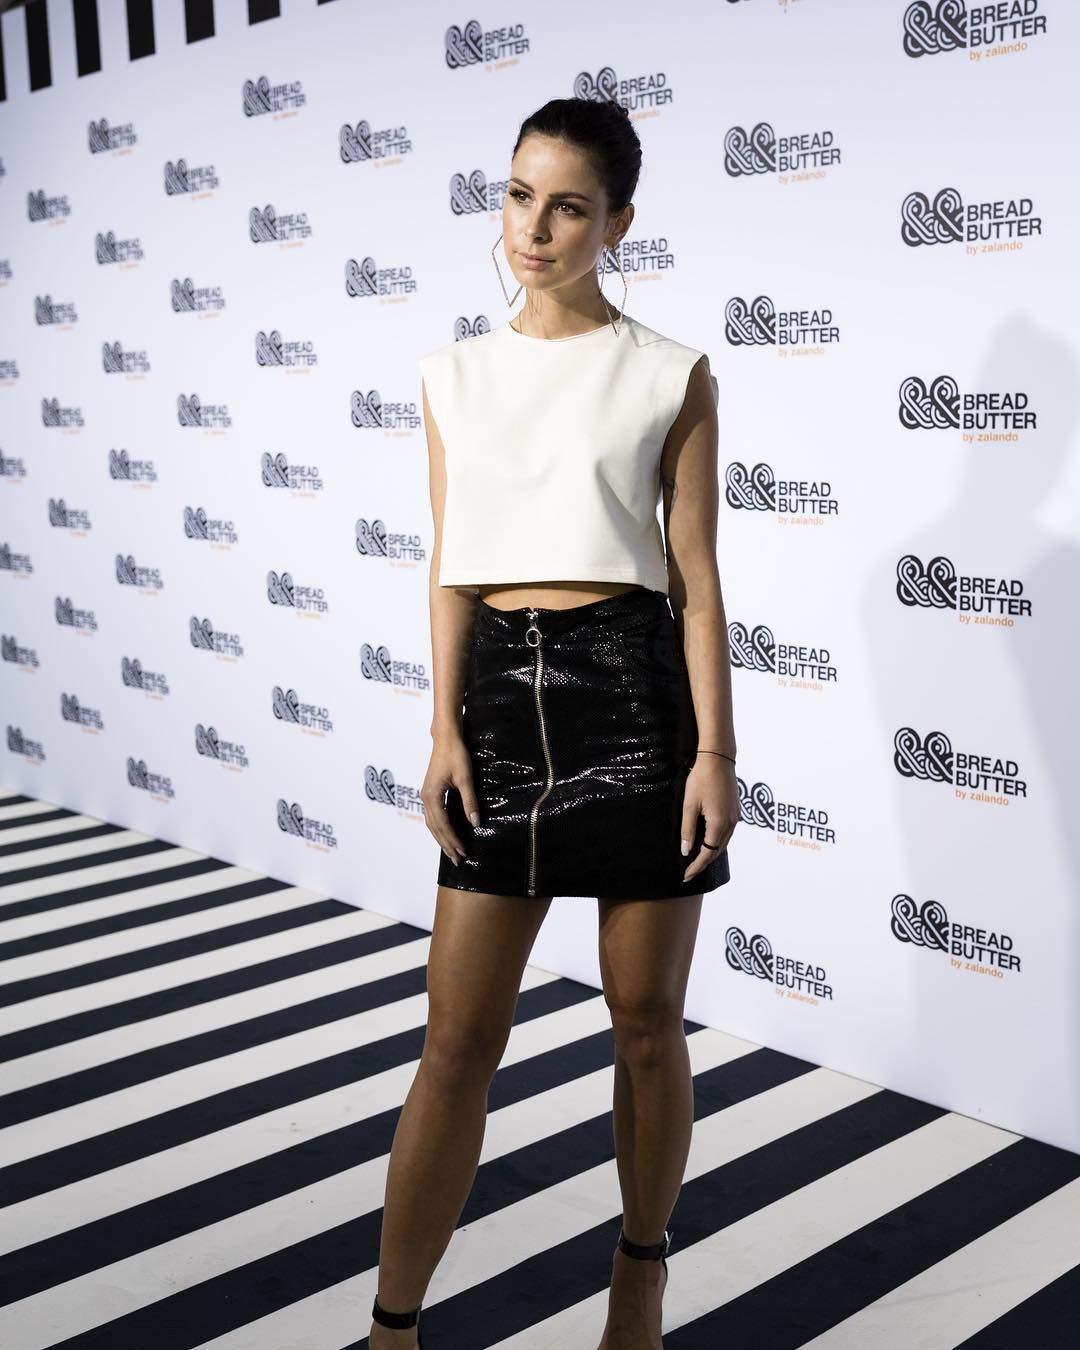 Lena Meyer-Landrut Attends Moschino TV H&M Pre-Shopping